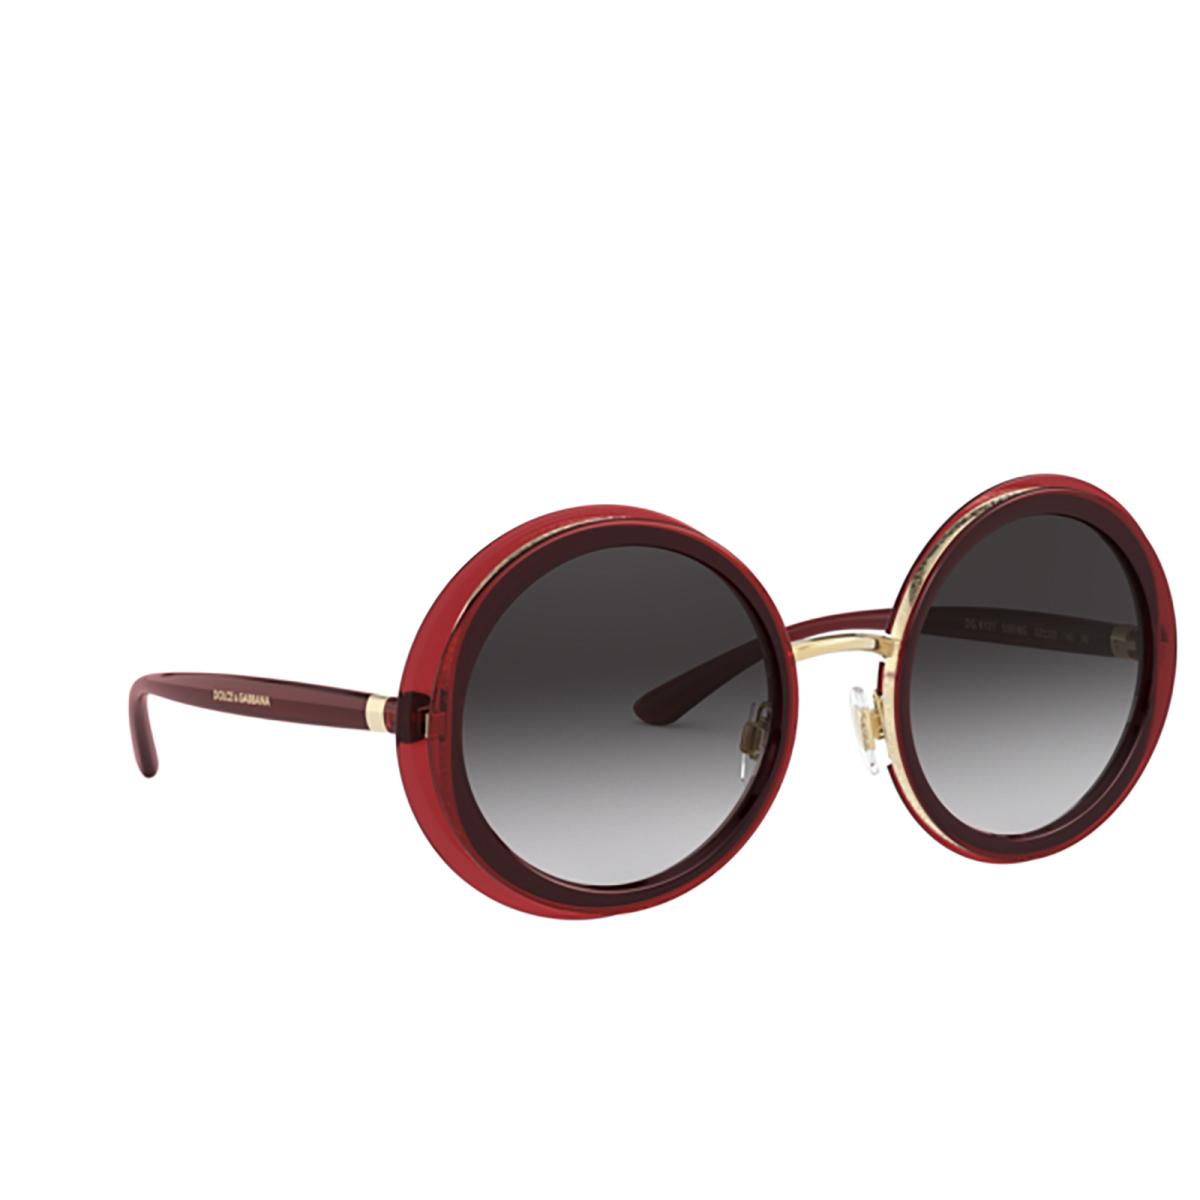 Dolce & Gabbana® Round Sunglasses: DG6127 color Transparent Red 550/8G - 2/3.